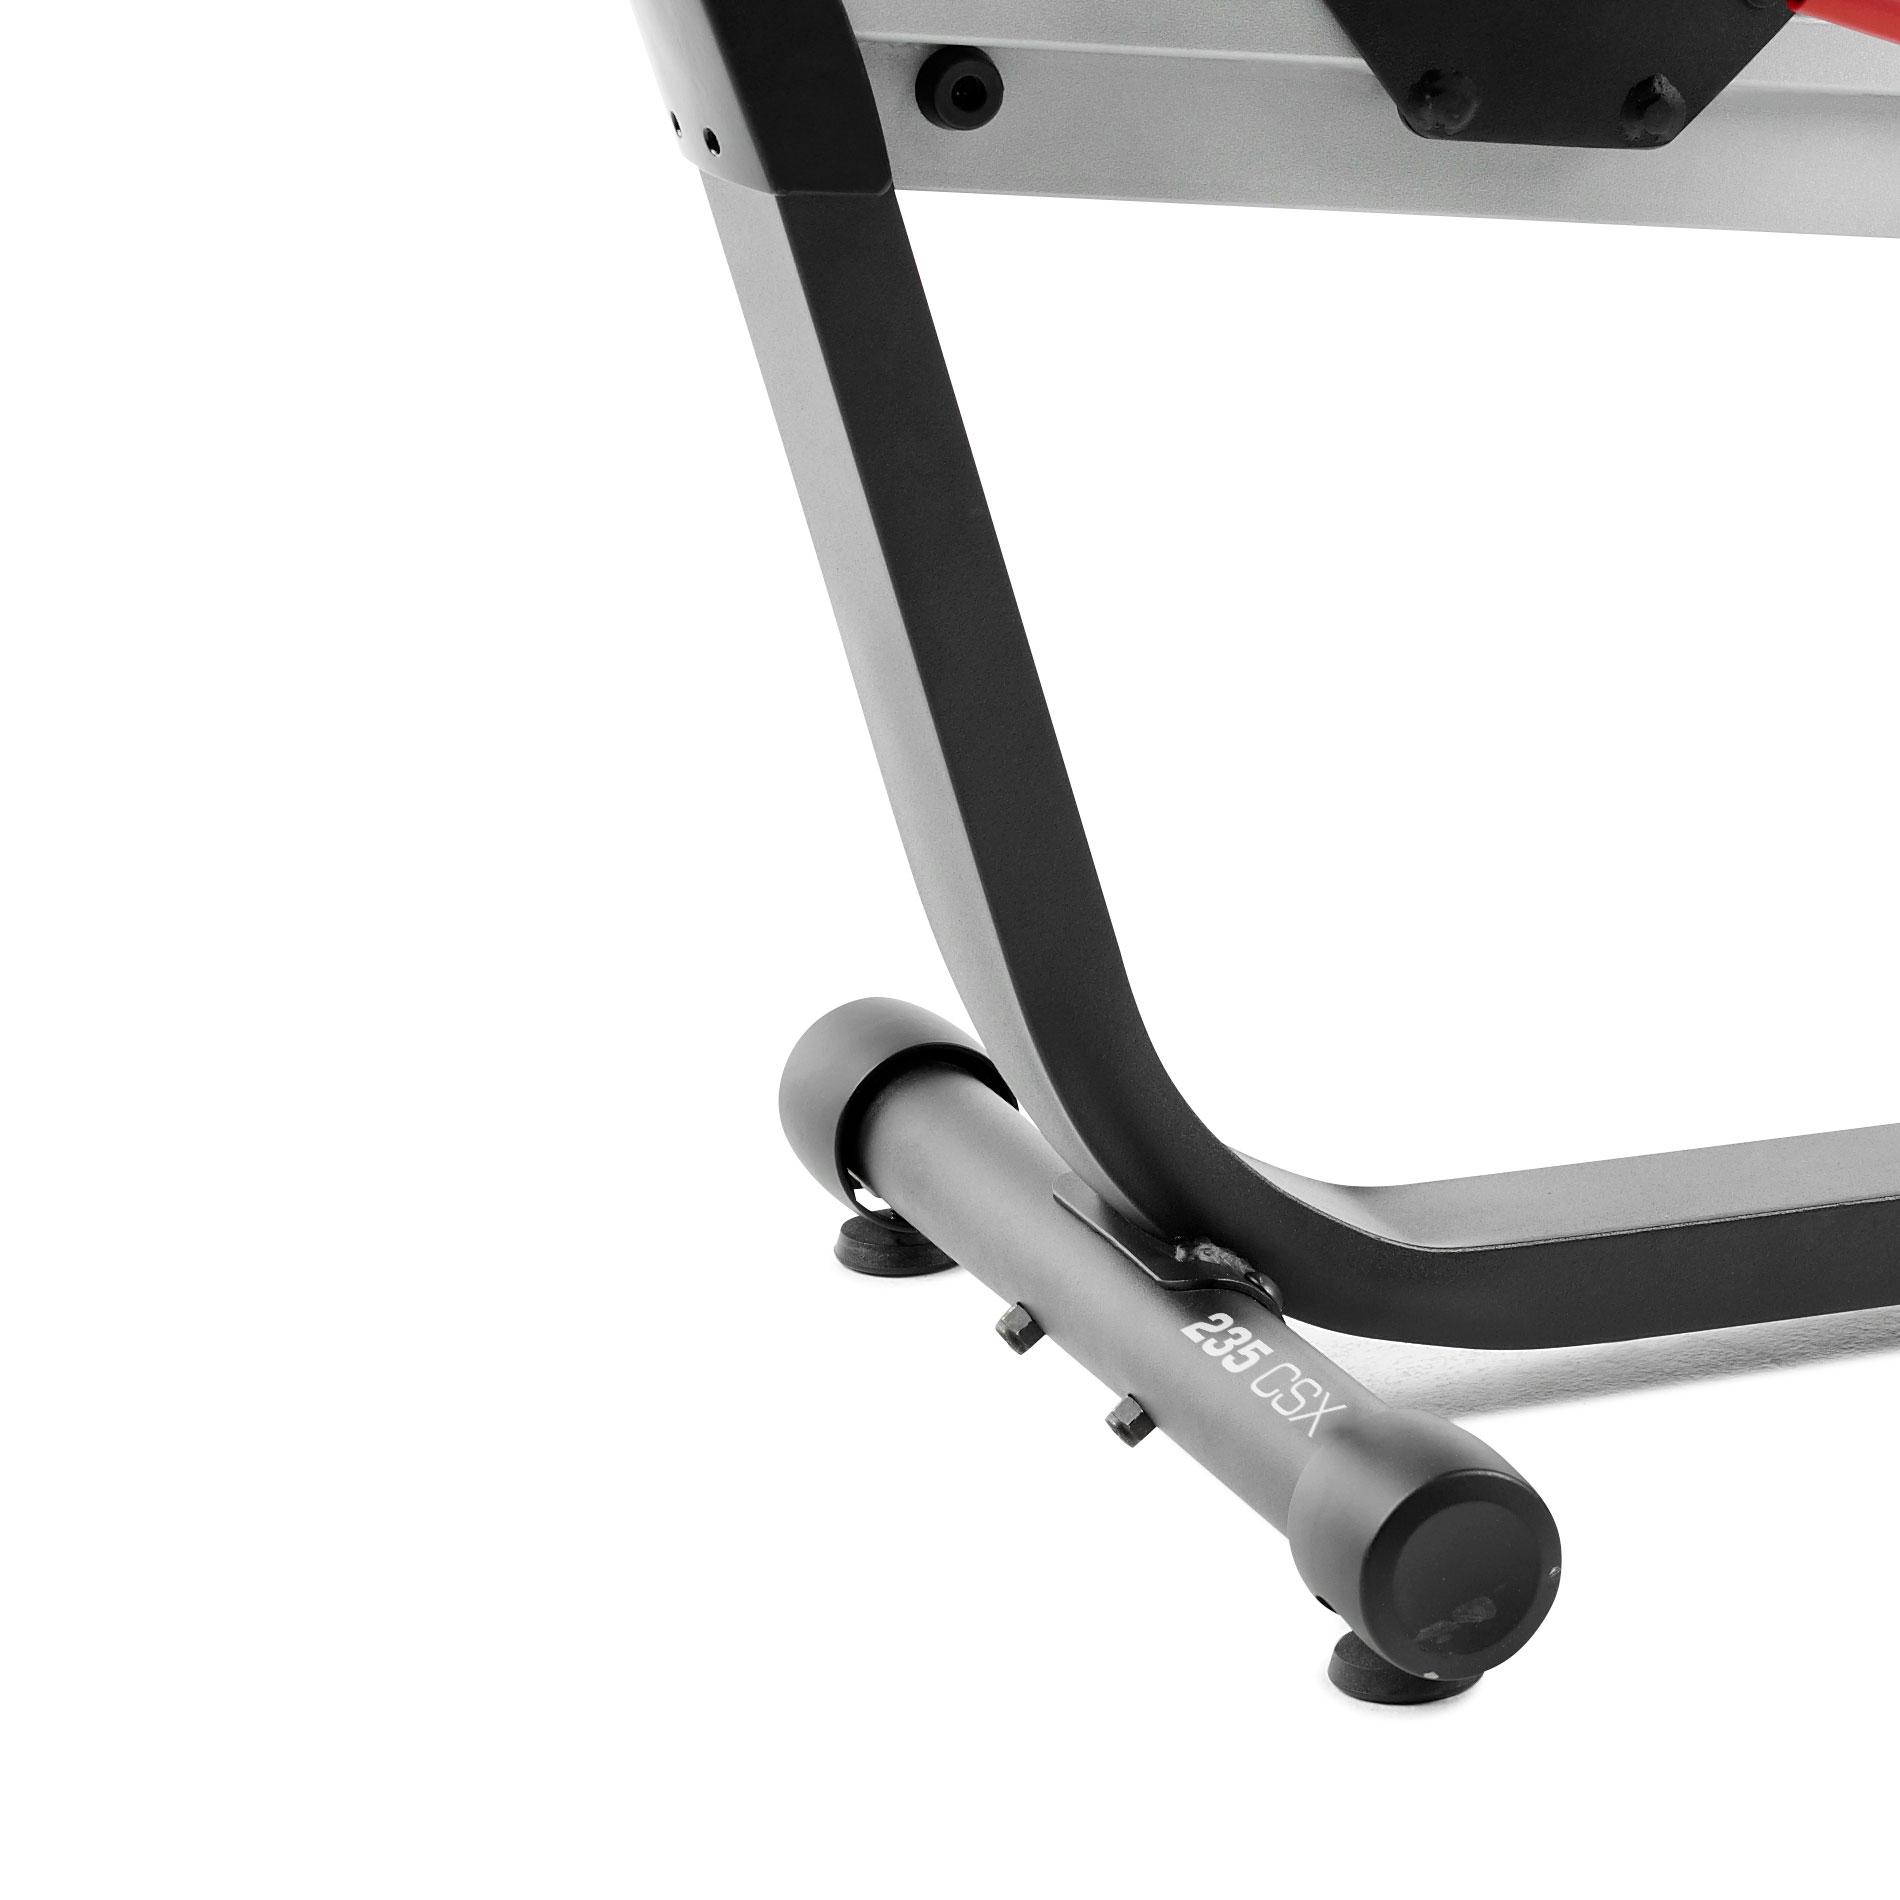 Inspirational Proform 770 Ekg Treadmill Reviews